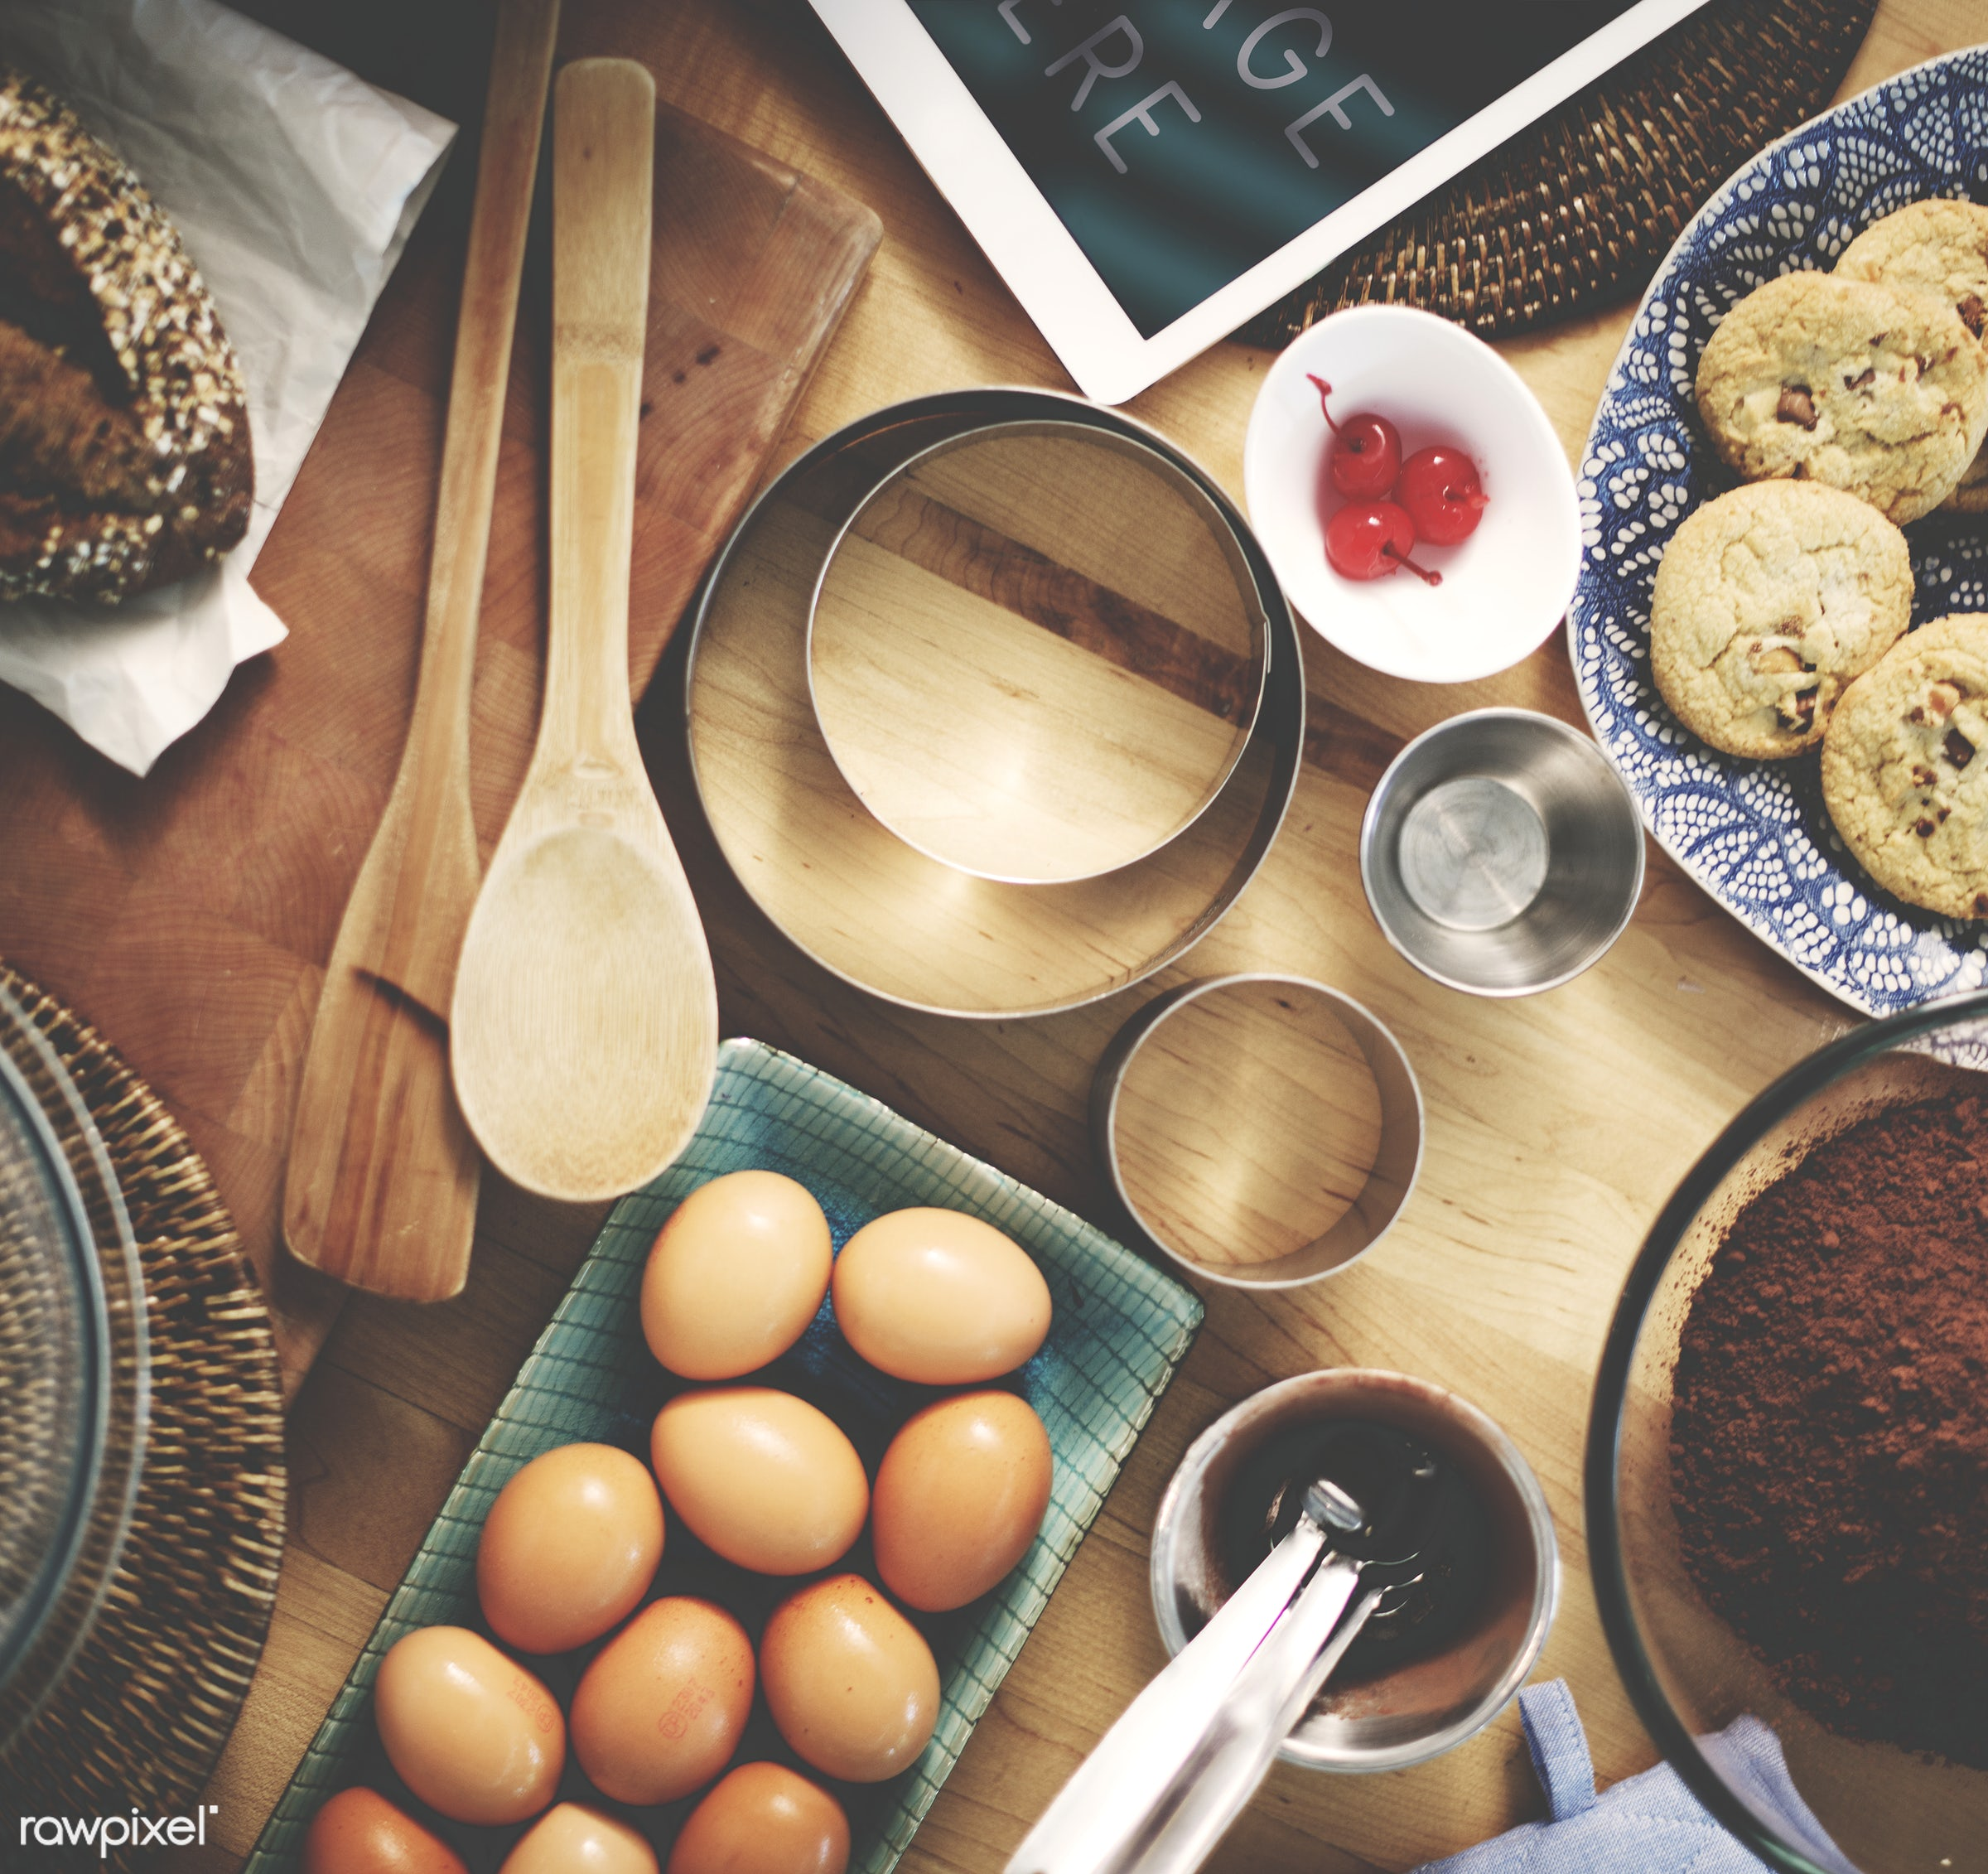 bake, bake shop, bakery, baking, chocolate chip cookies, cook, cookies, cooking, cutlery, delicious, eggs, equipment, food,...